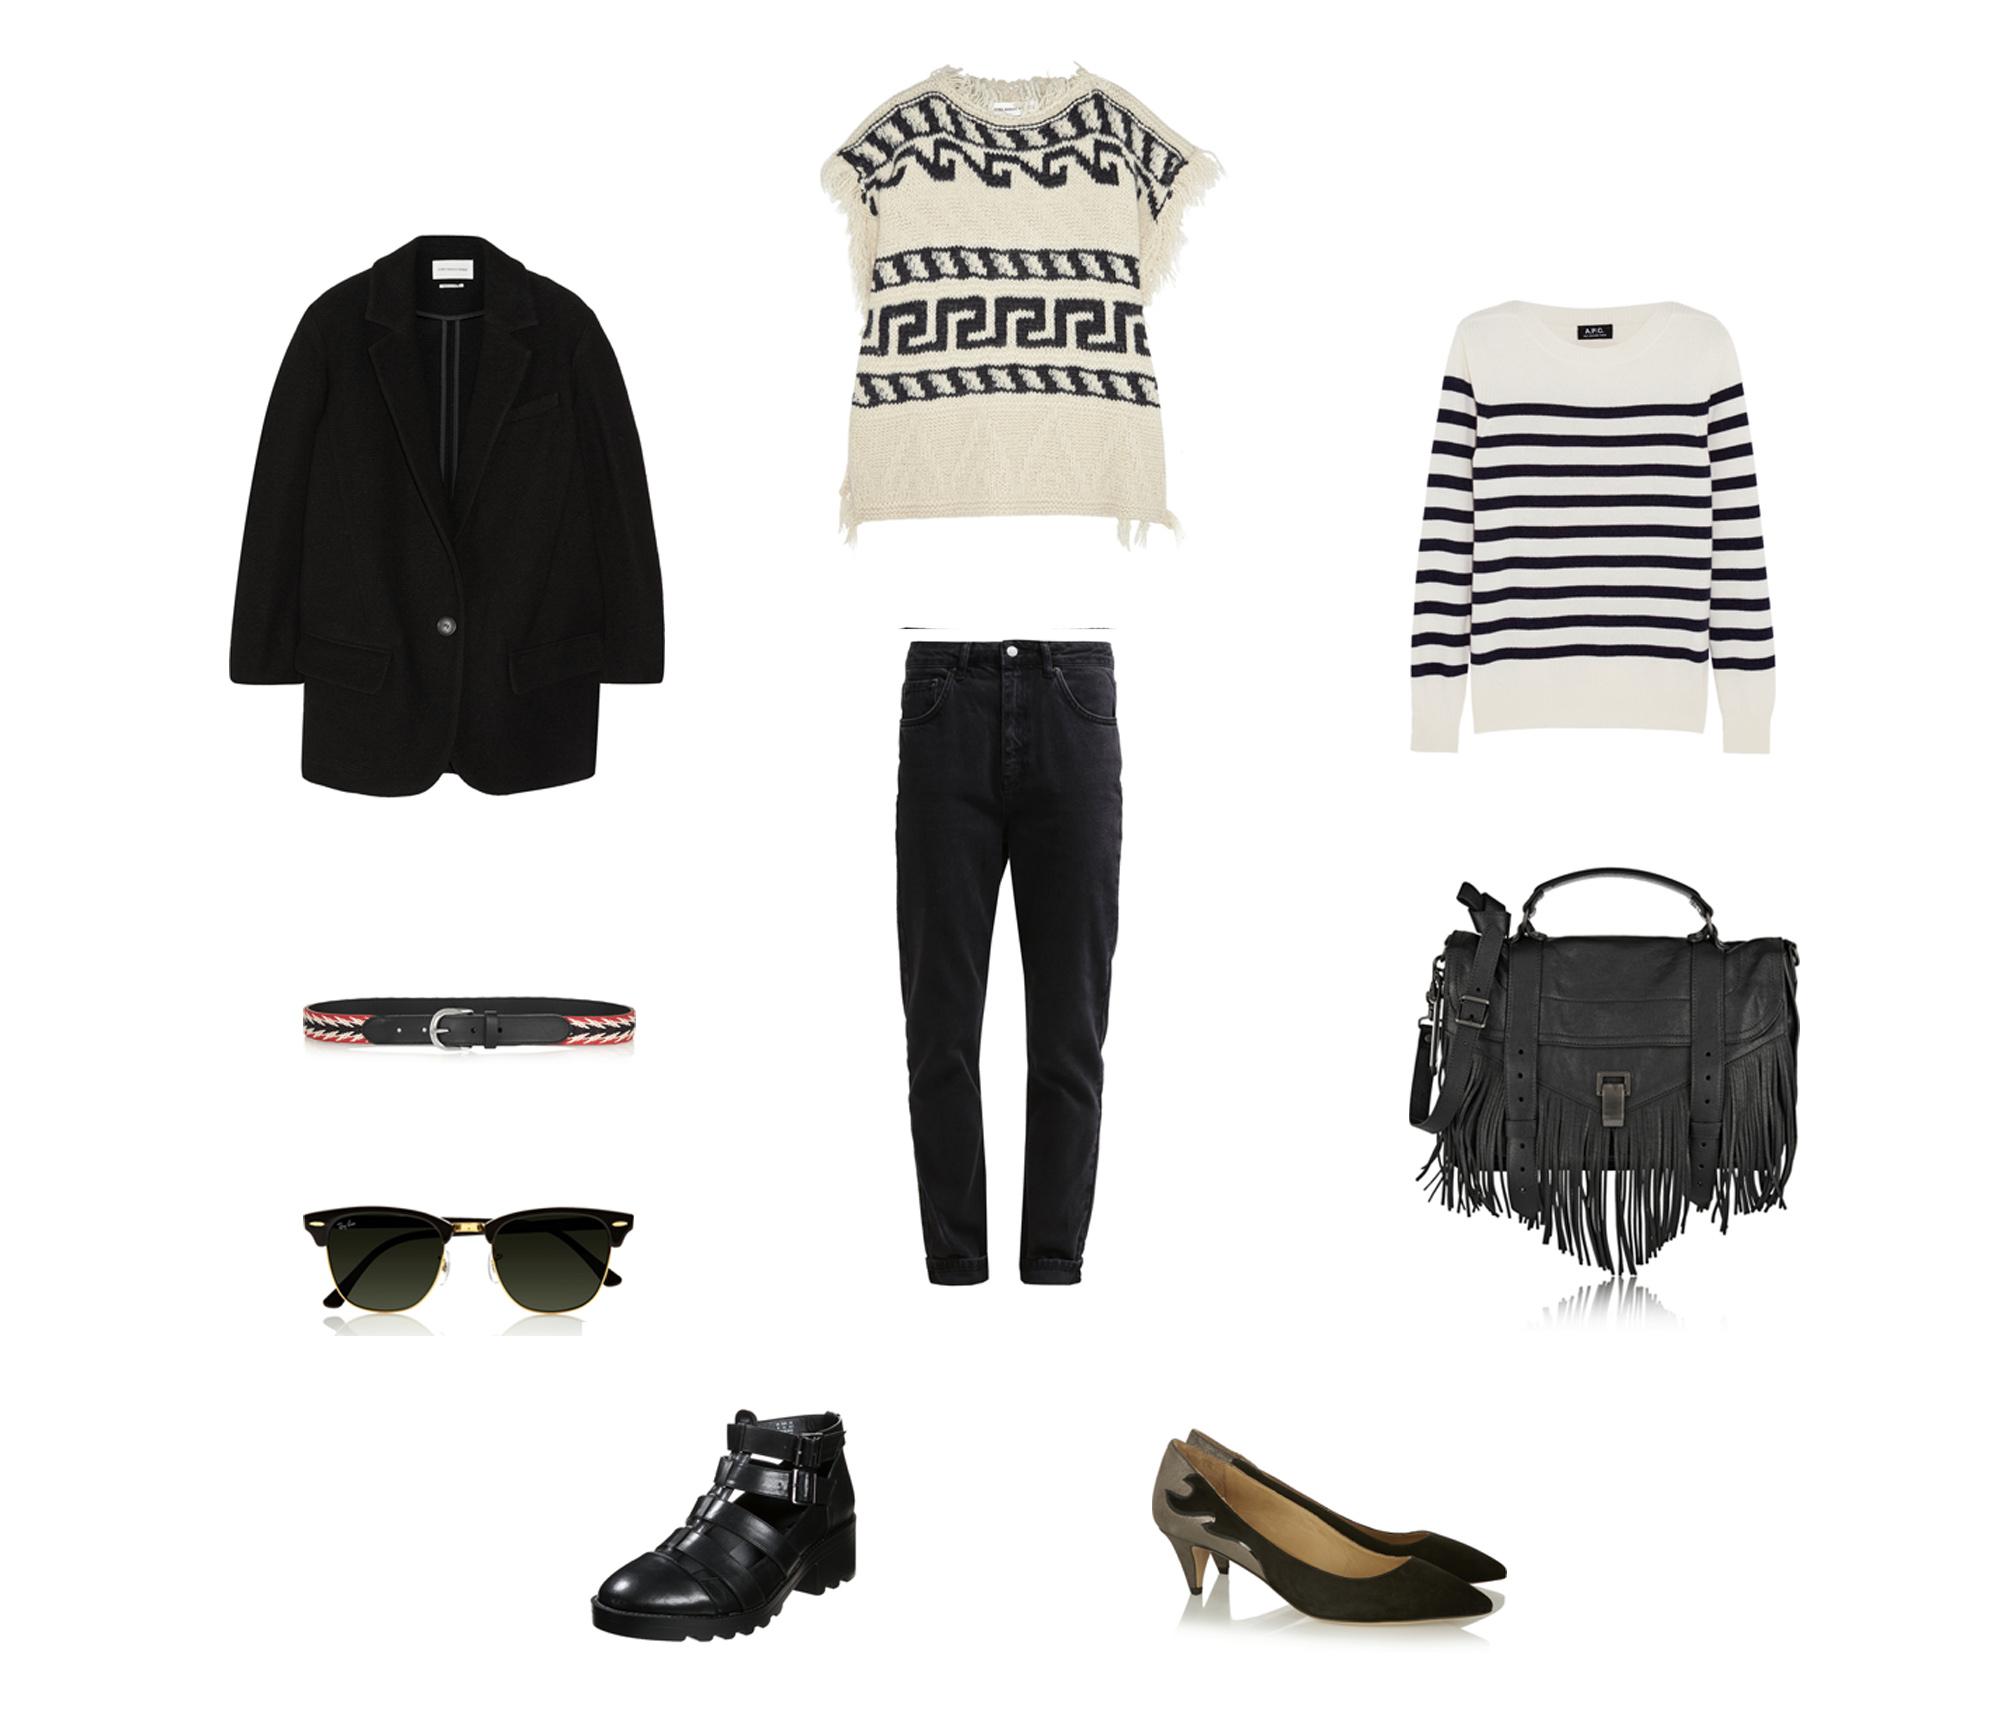 Clochet_isabel_marant_kitten_heels_topshop_mom_jeans_proenza_schouler_fringed_bag